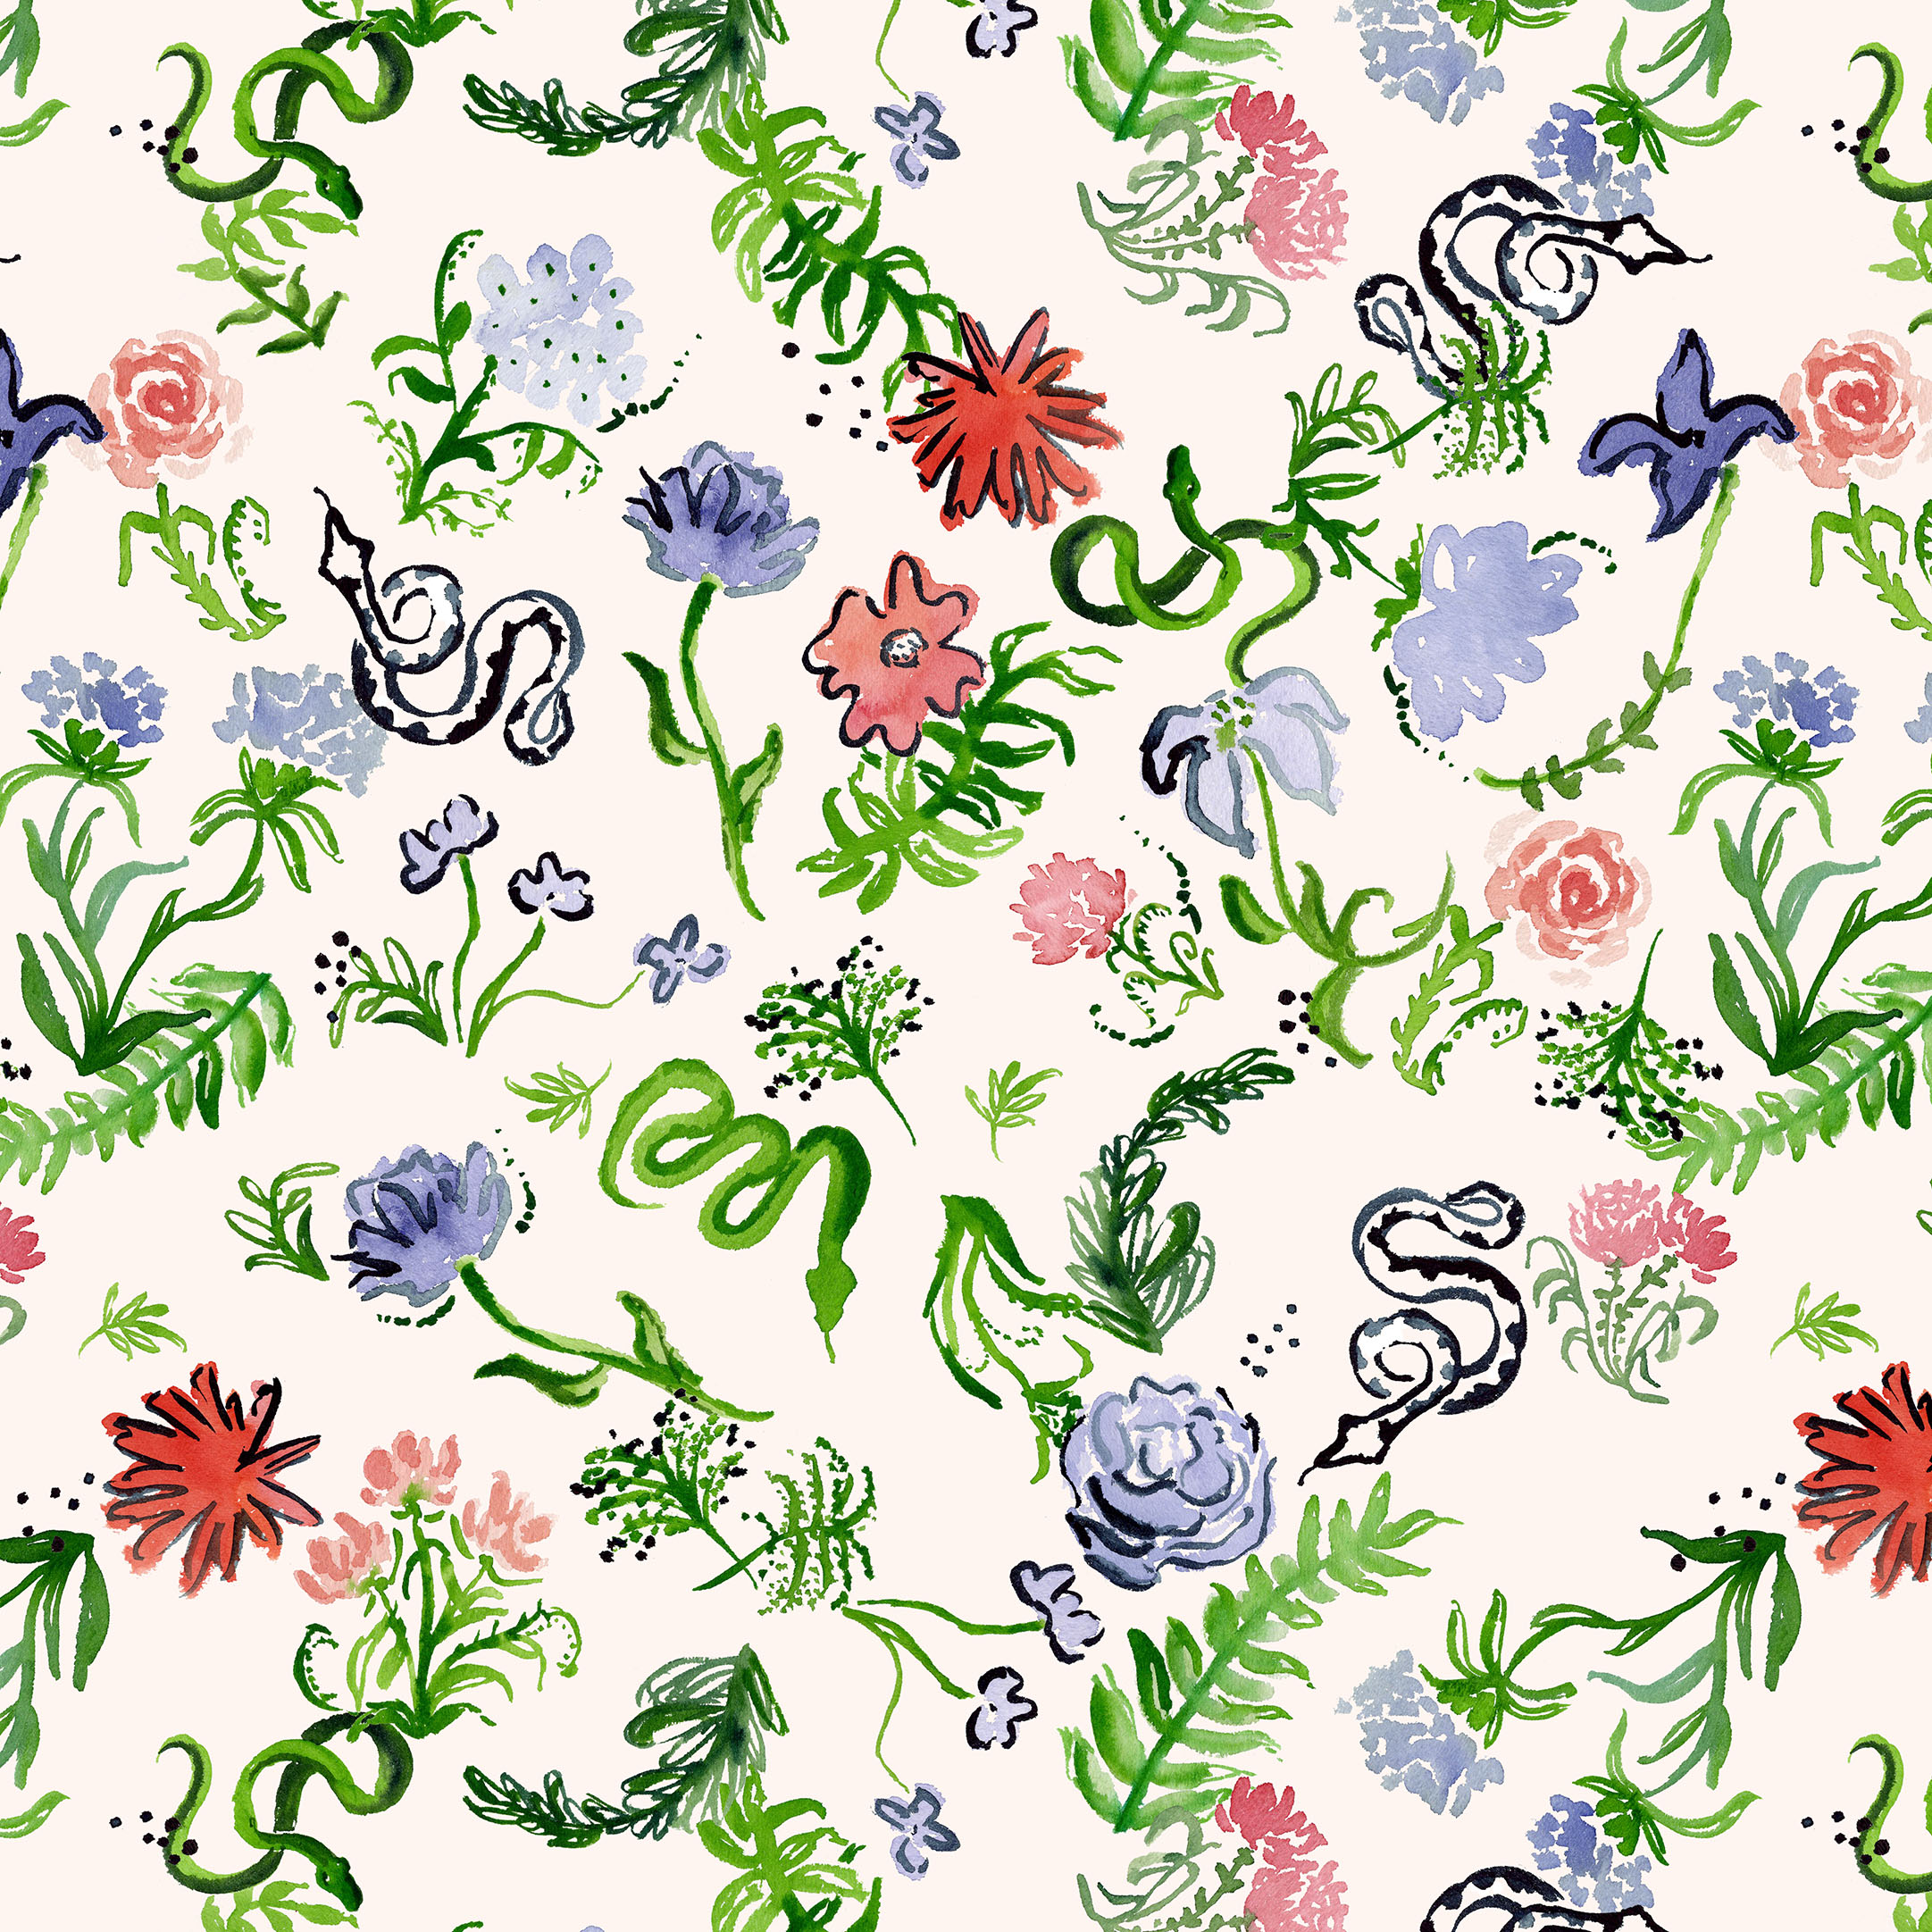 snake and floral_150.jpg